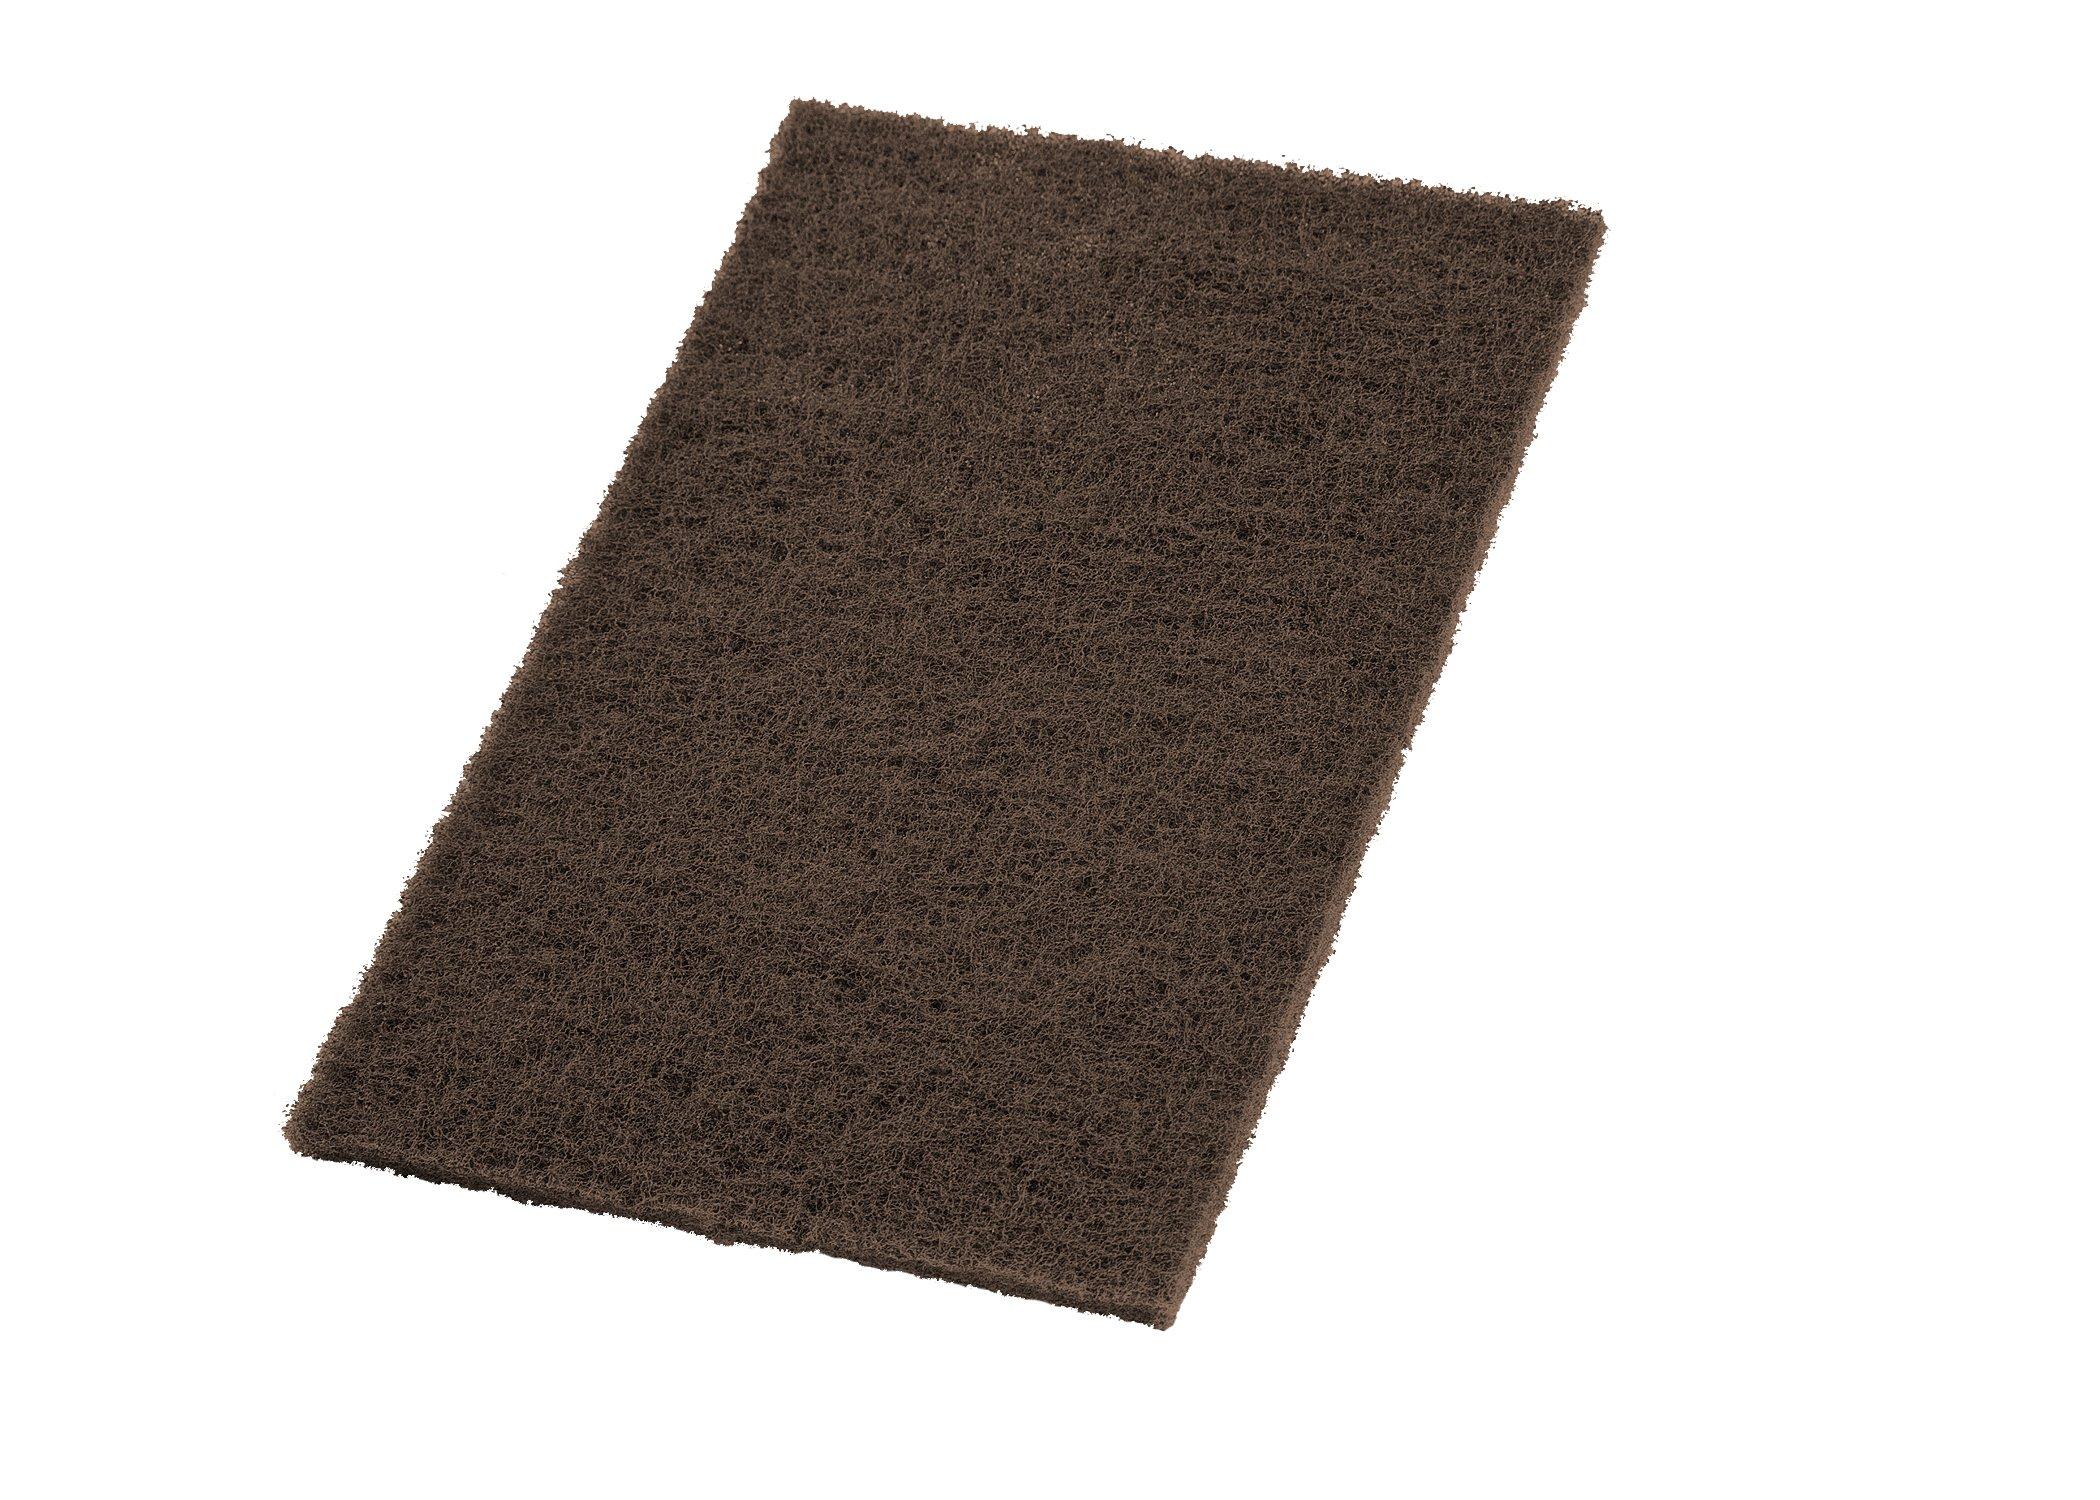 VSM Abrasive Hand Pad Hand Pad, 6'' x 9'', Tan, Coarse Grade, (Pack of 10) by VSM